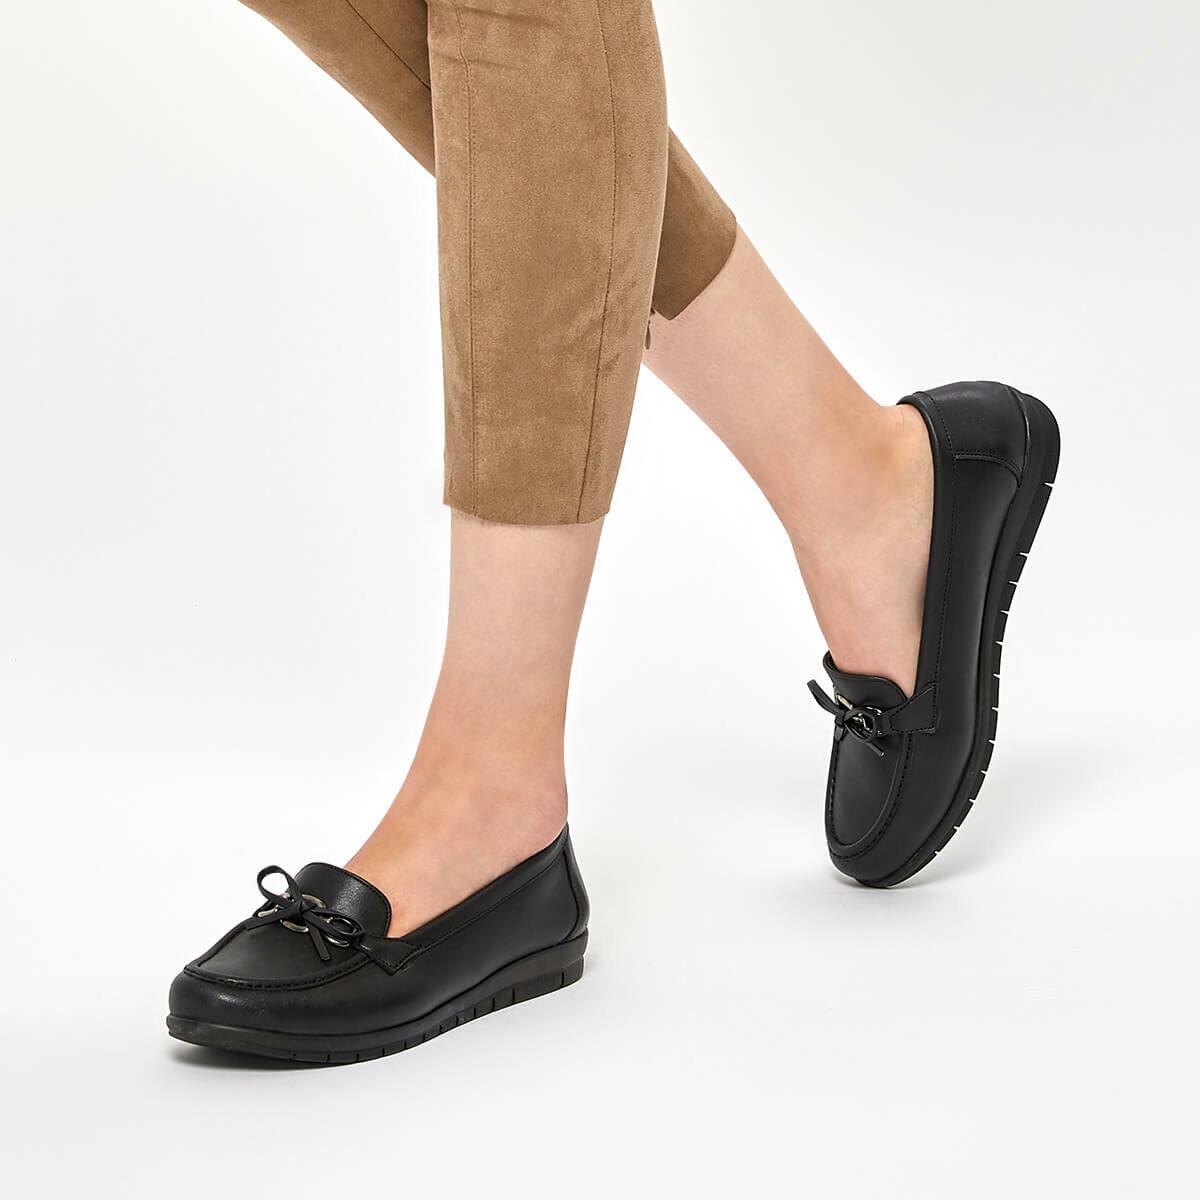 FLO 92. 156915.Z Black Women Basic Comfort Polaris